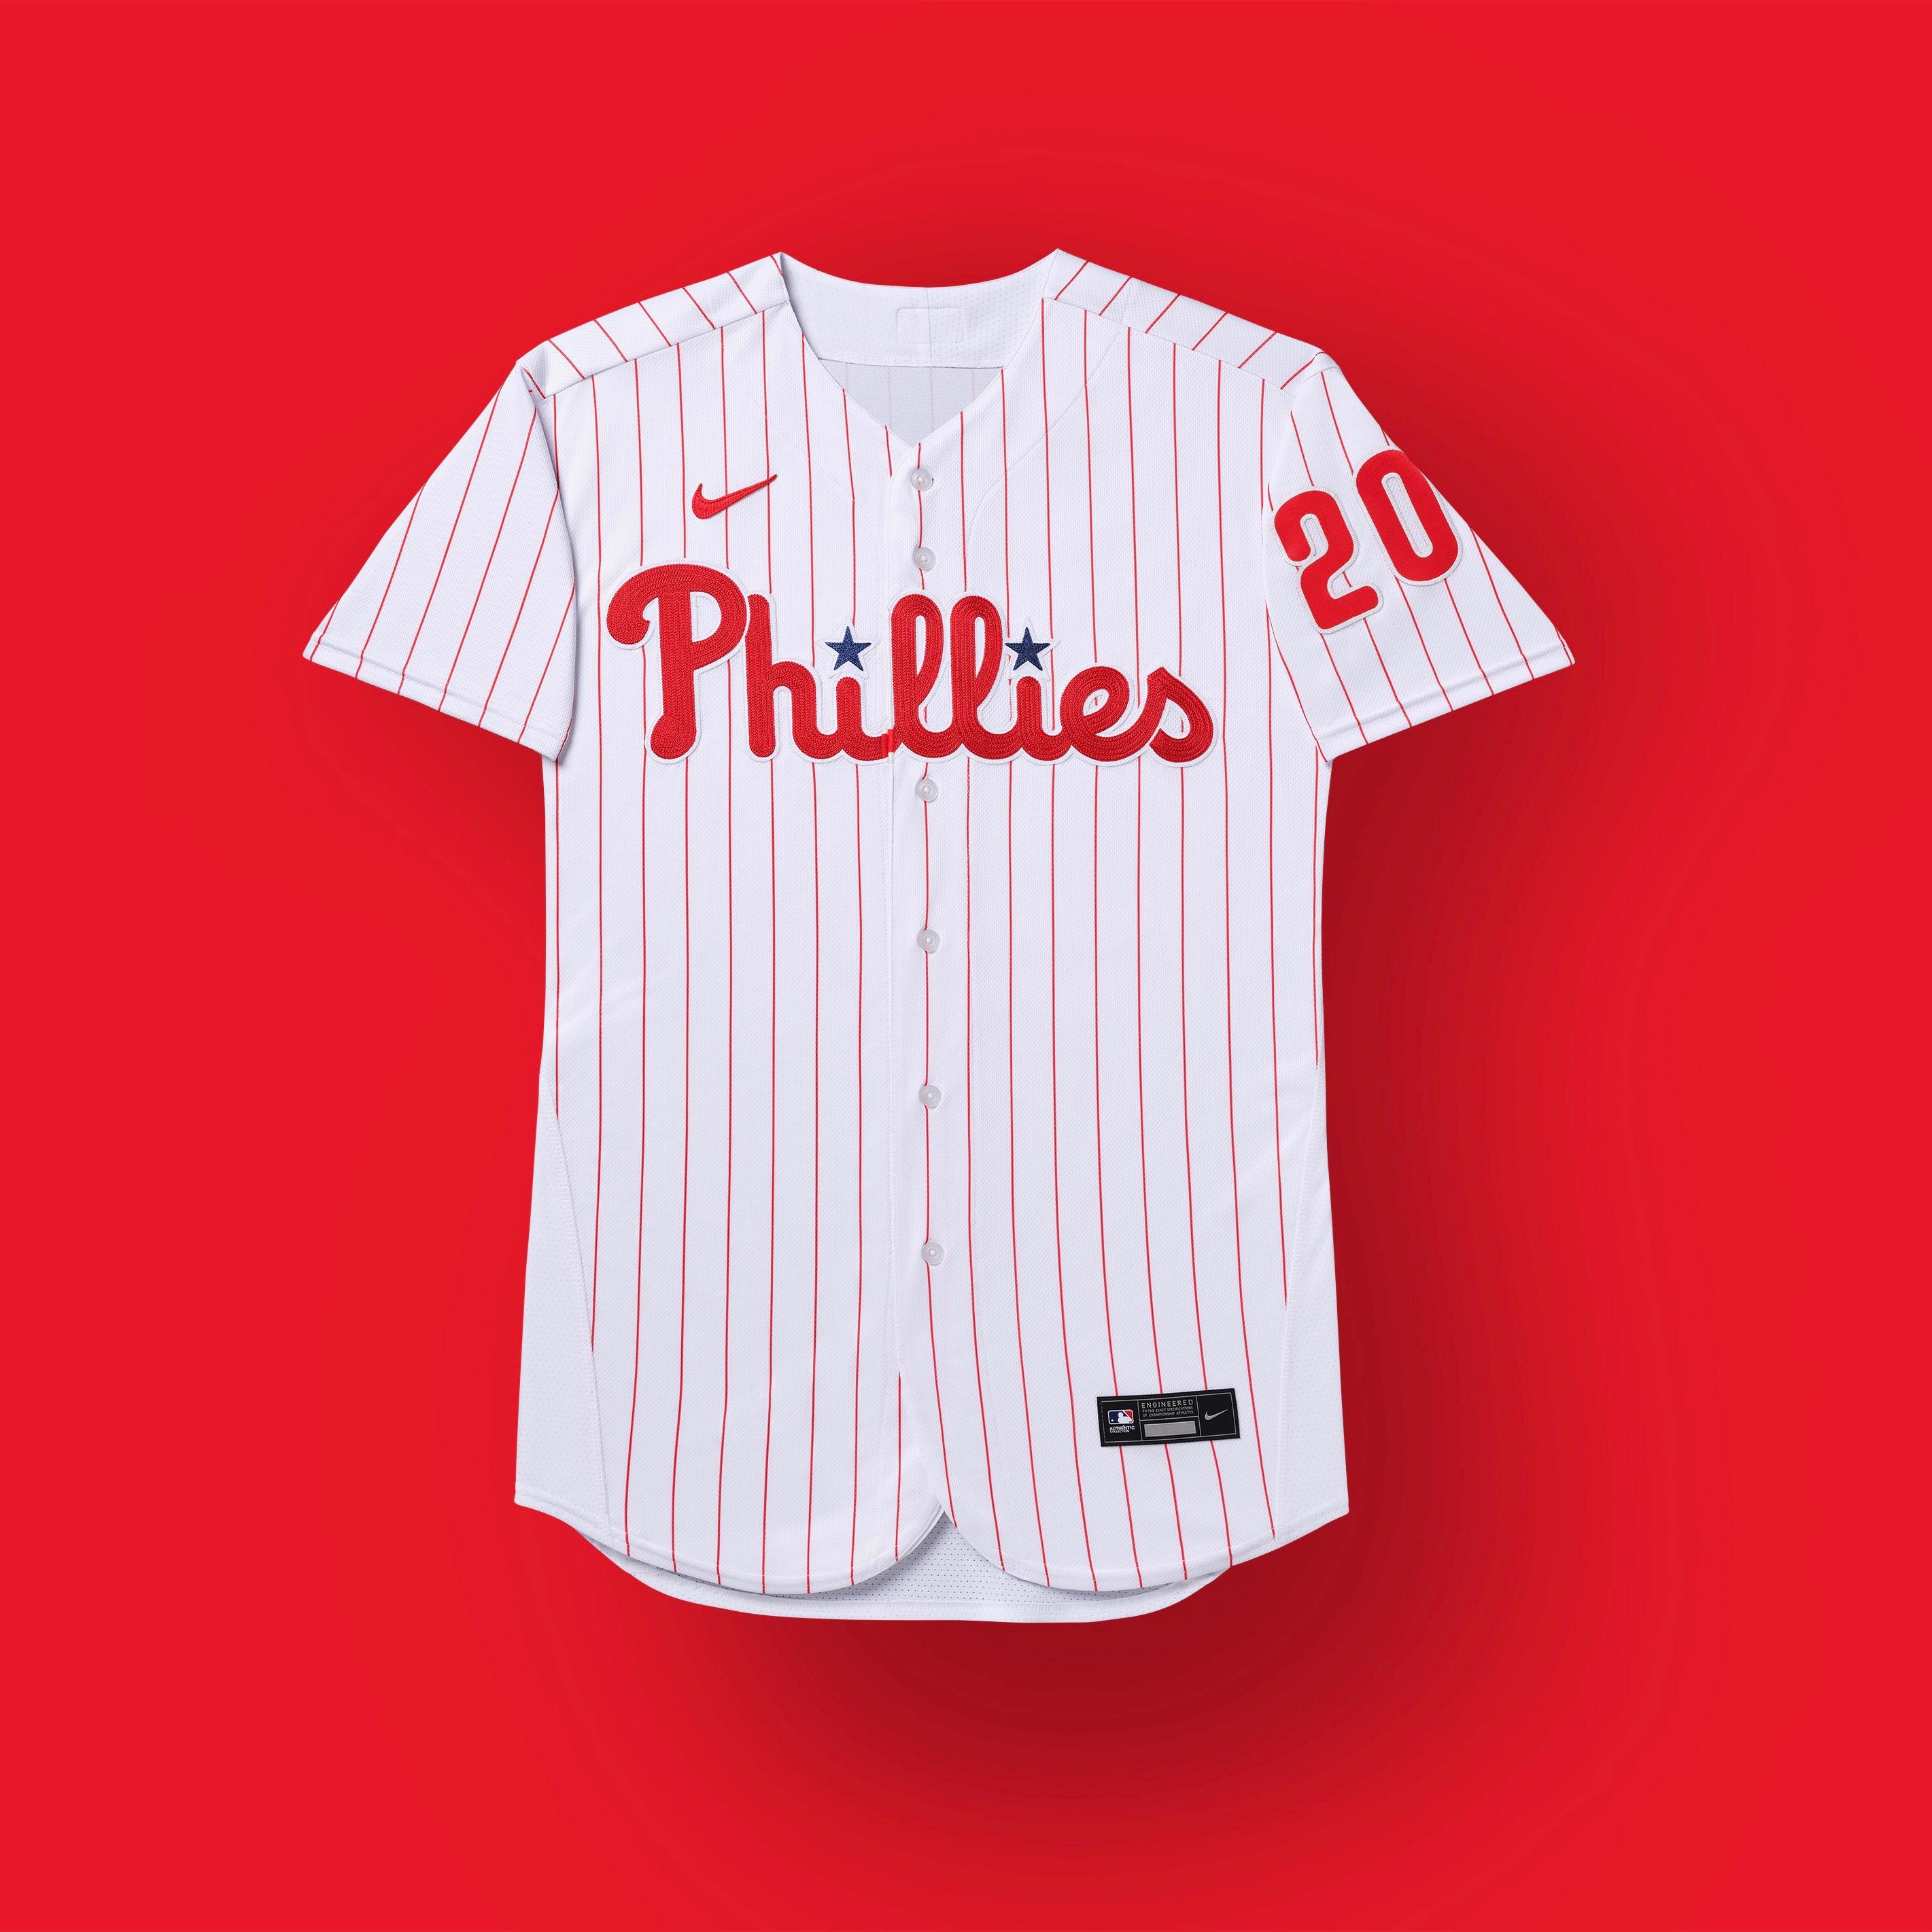 philadelphia phillies 2020 uniforms